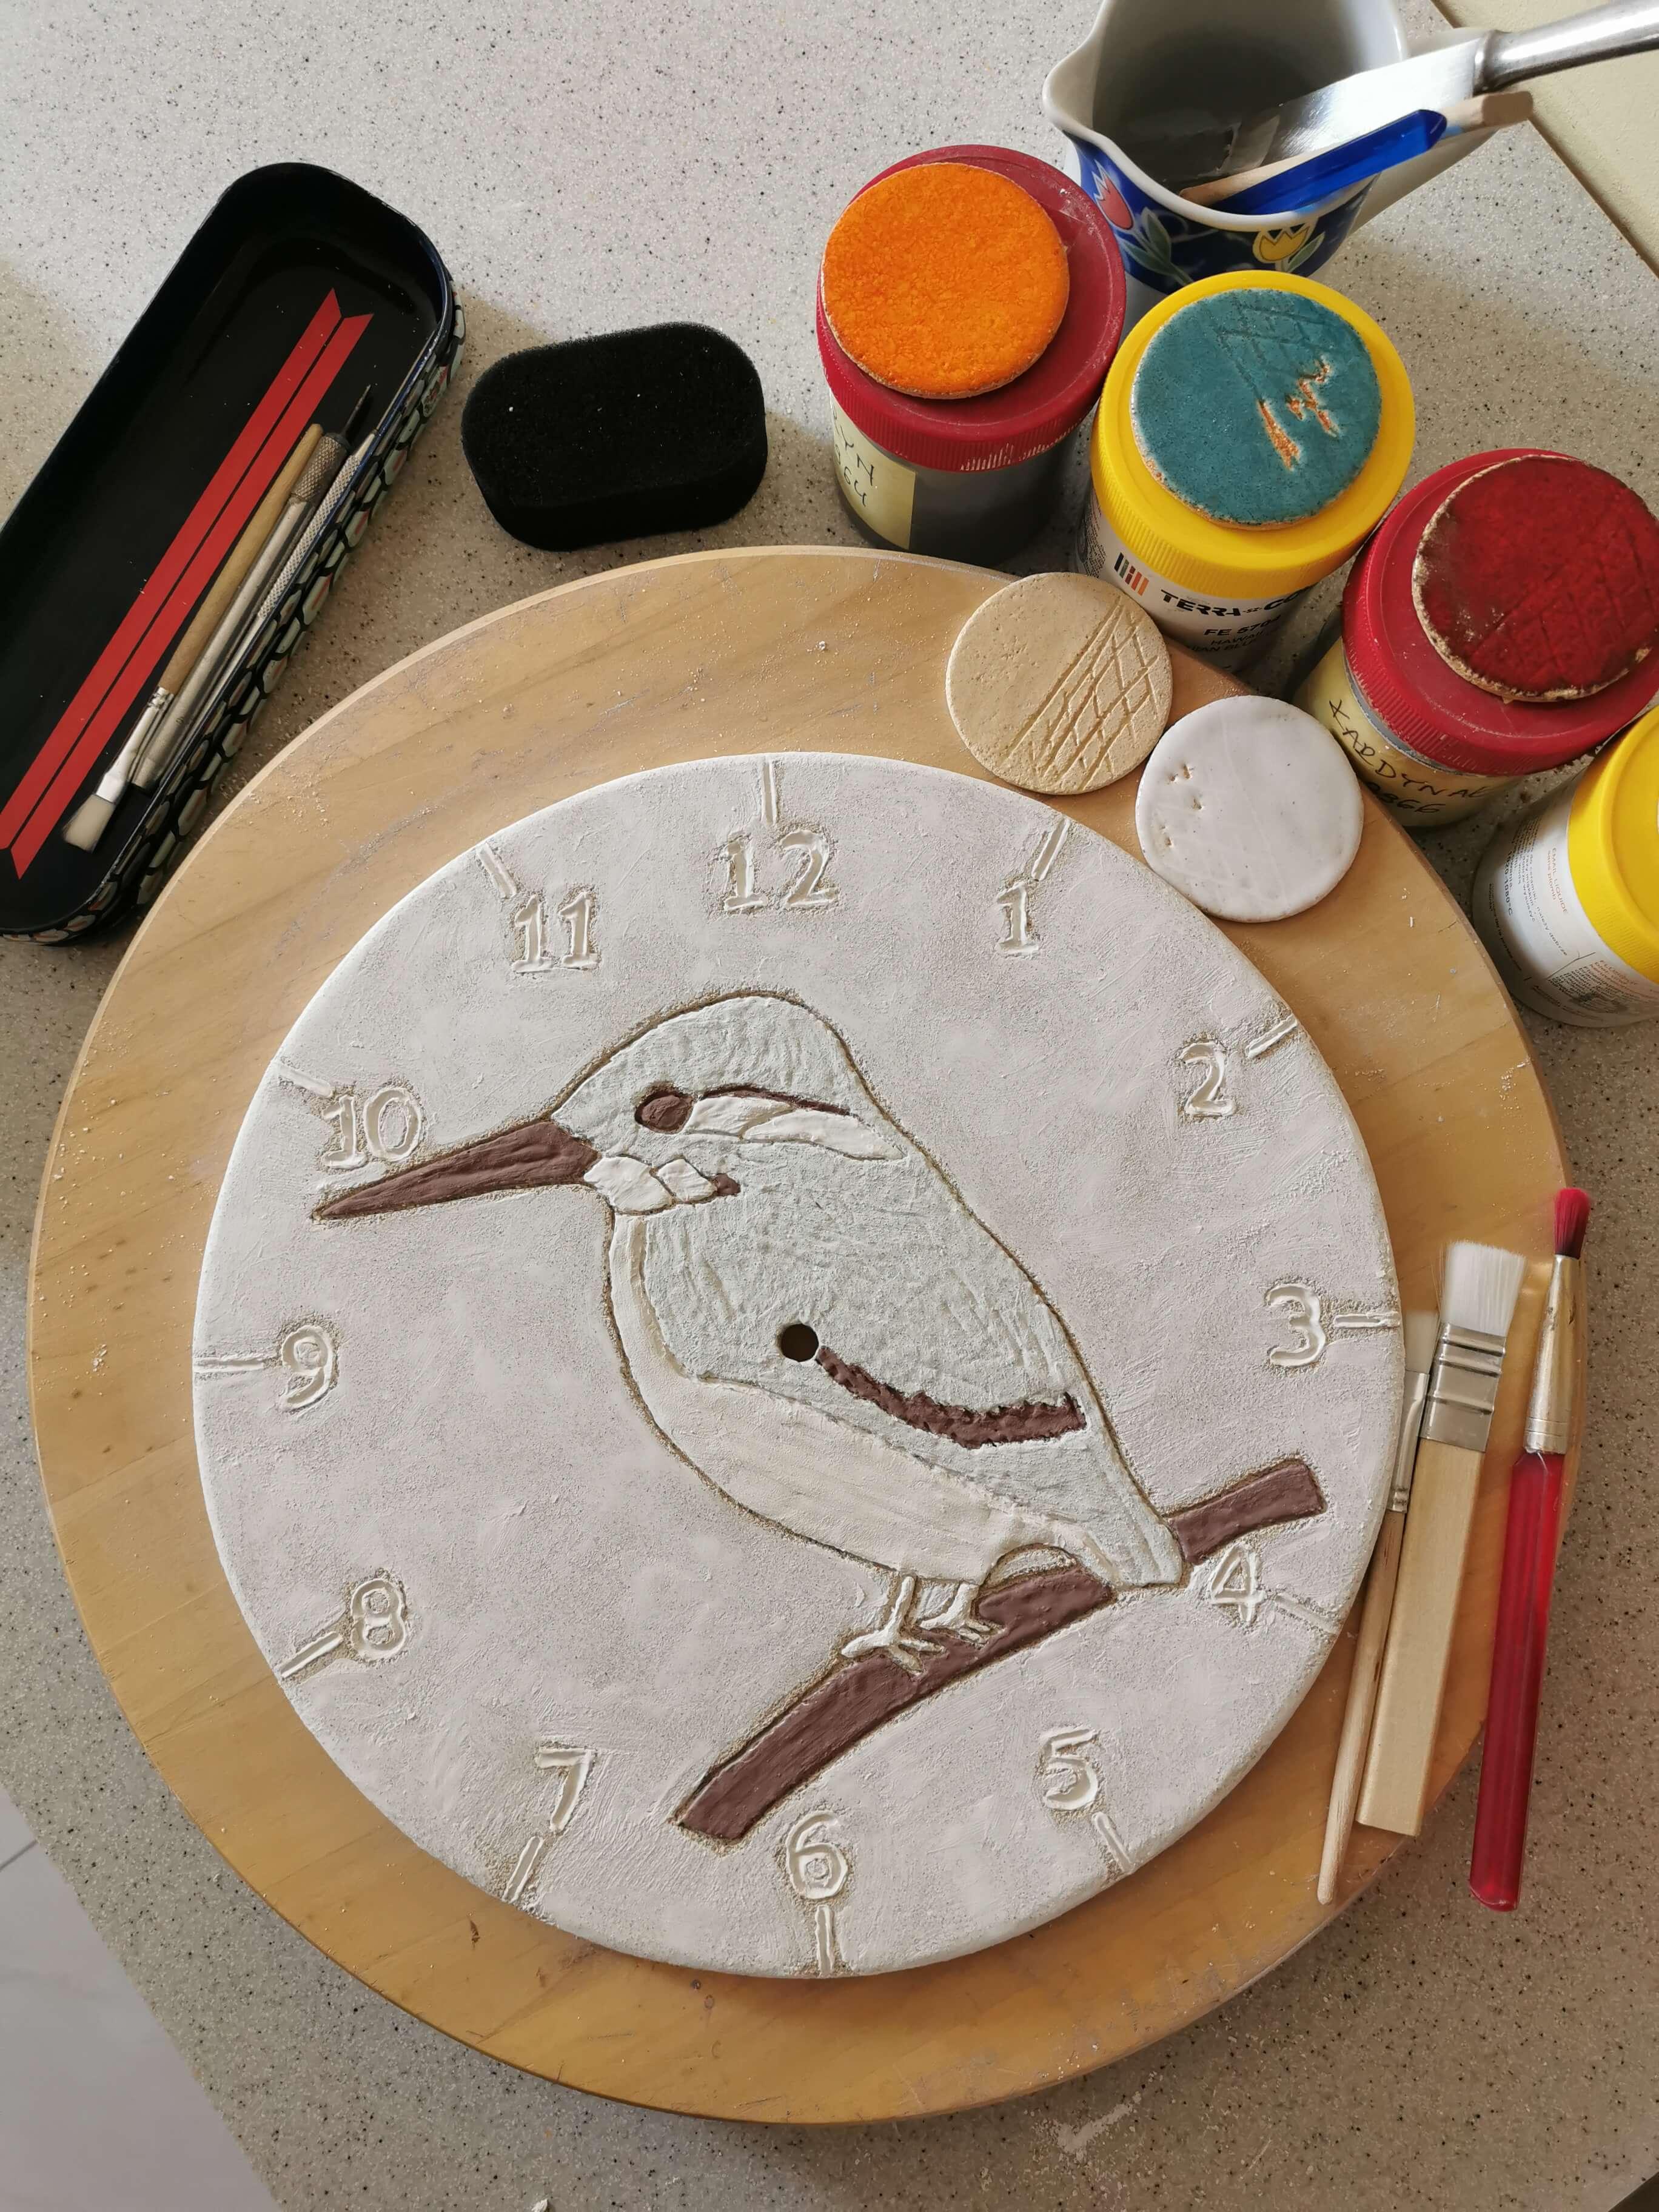 ptasi-zegar-zimorodek-w-trakcie-pracy